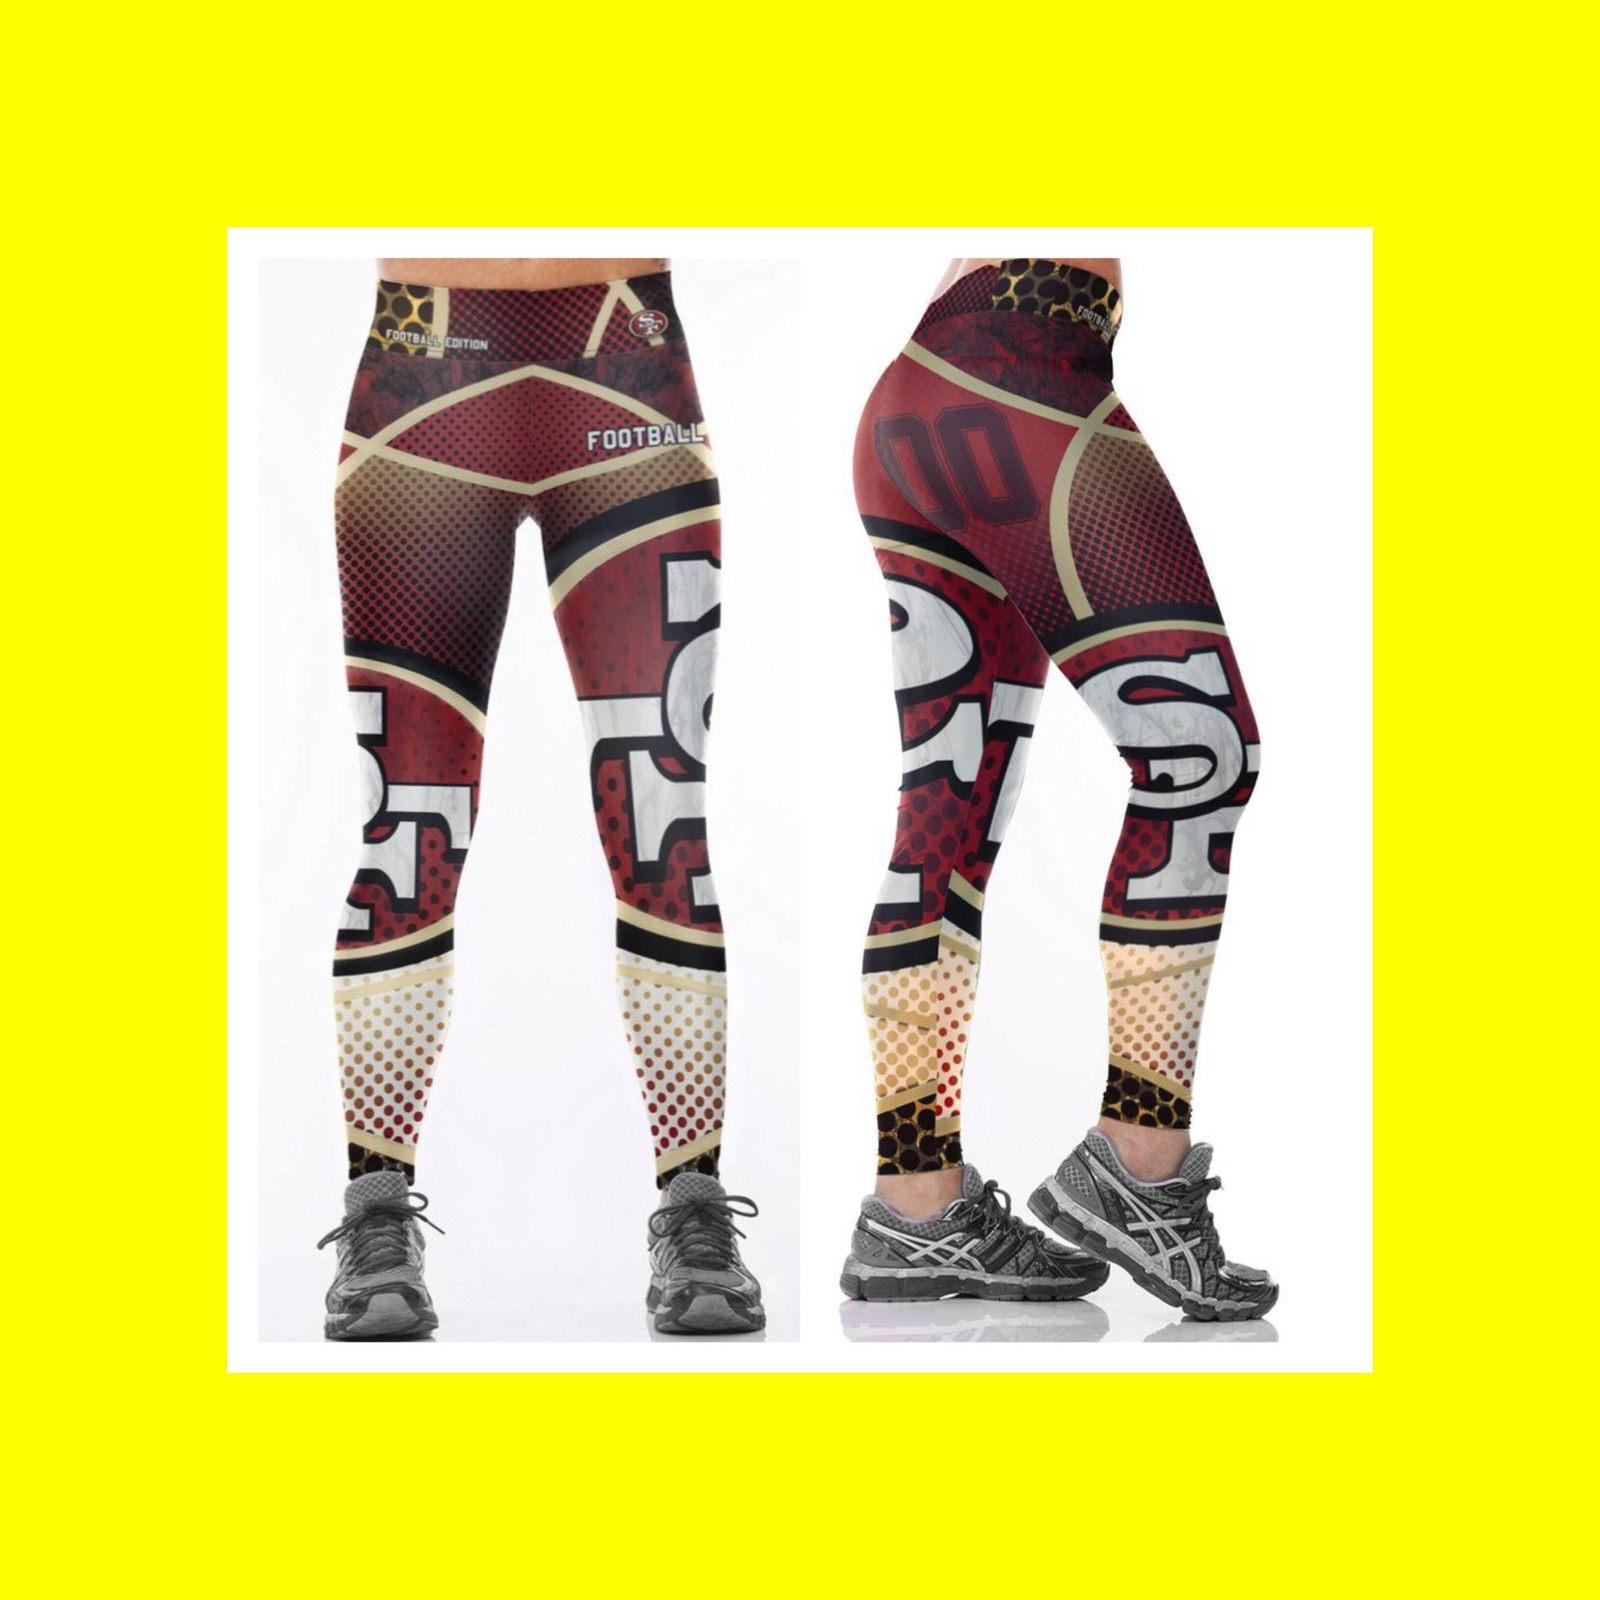 finest selection 065bd 76e3e 49ERS Leggings - Women Fan Gear - NFL San and 13 similar items